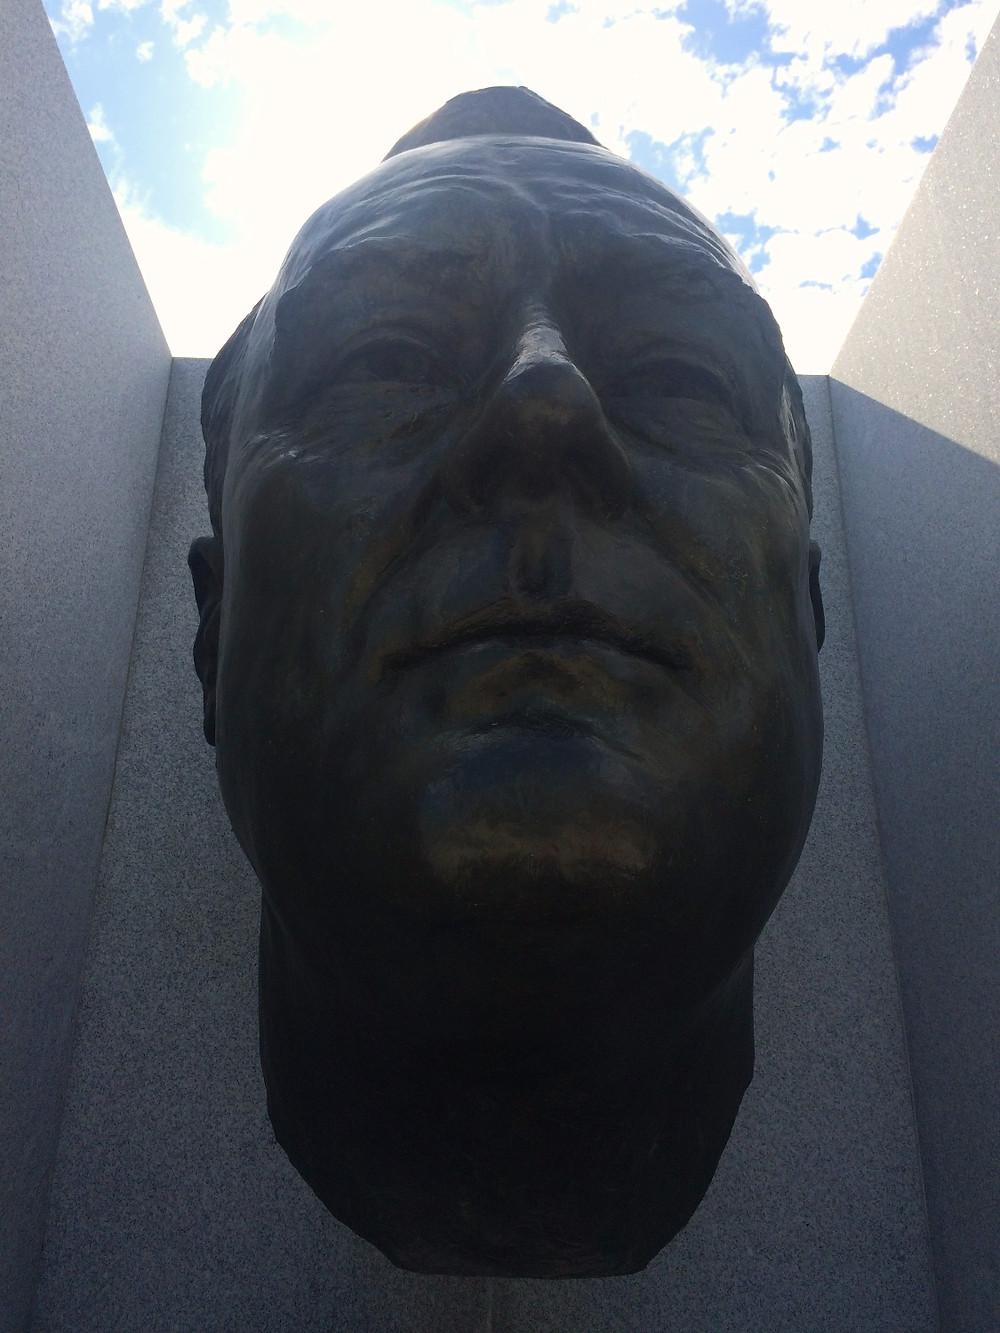 Franklin Delano Roosvelt, Roosvelt Island, New York City